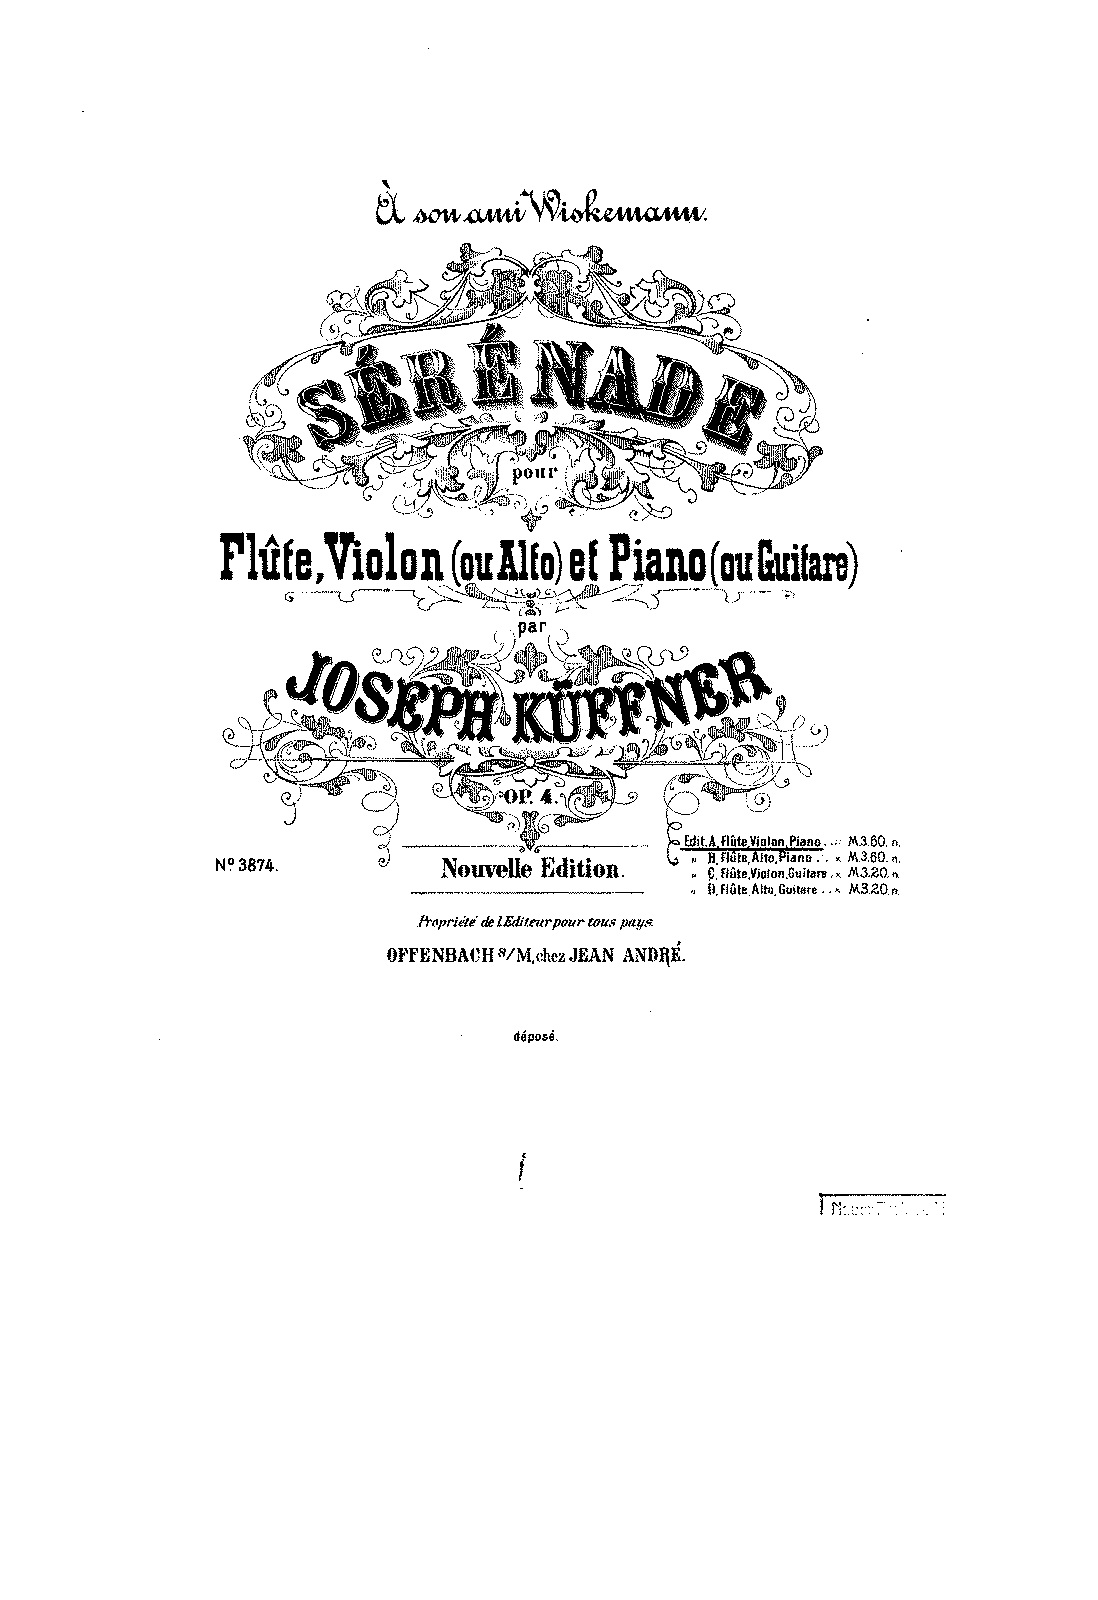 Serenade for Flute, Violin and Piano, Op.4 (Küffner